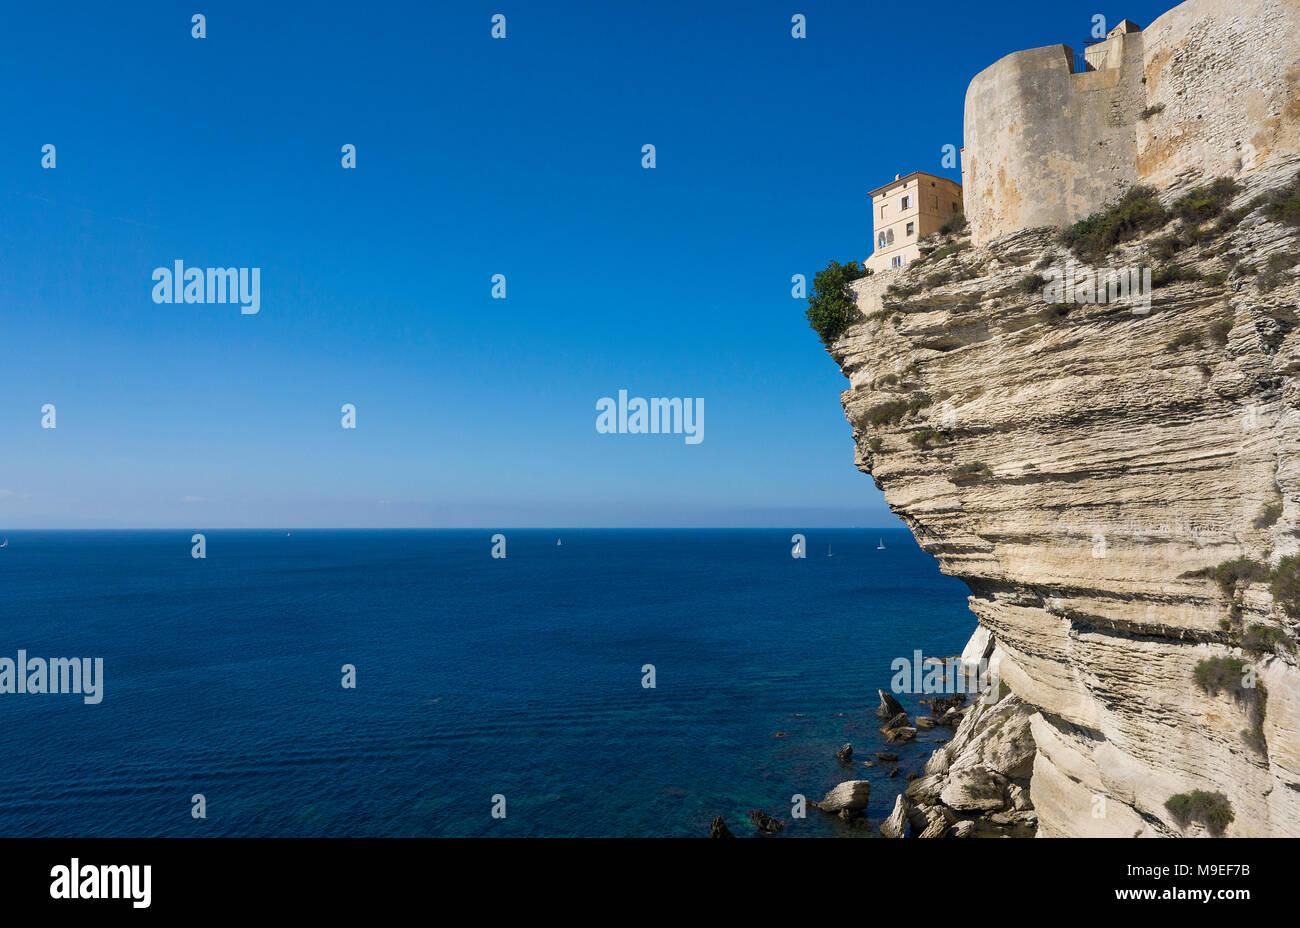 Citadel of Bonifacio, built on chalkstone cliff, Strait of Bonifacio, Corsica, France, Mediterranean, Europe - Stock Image